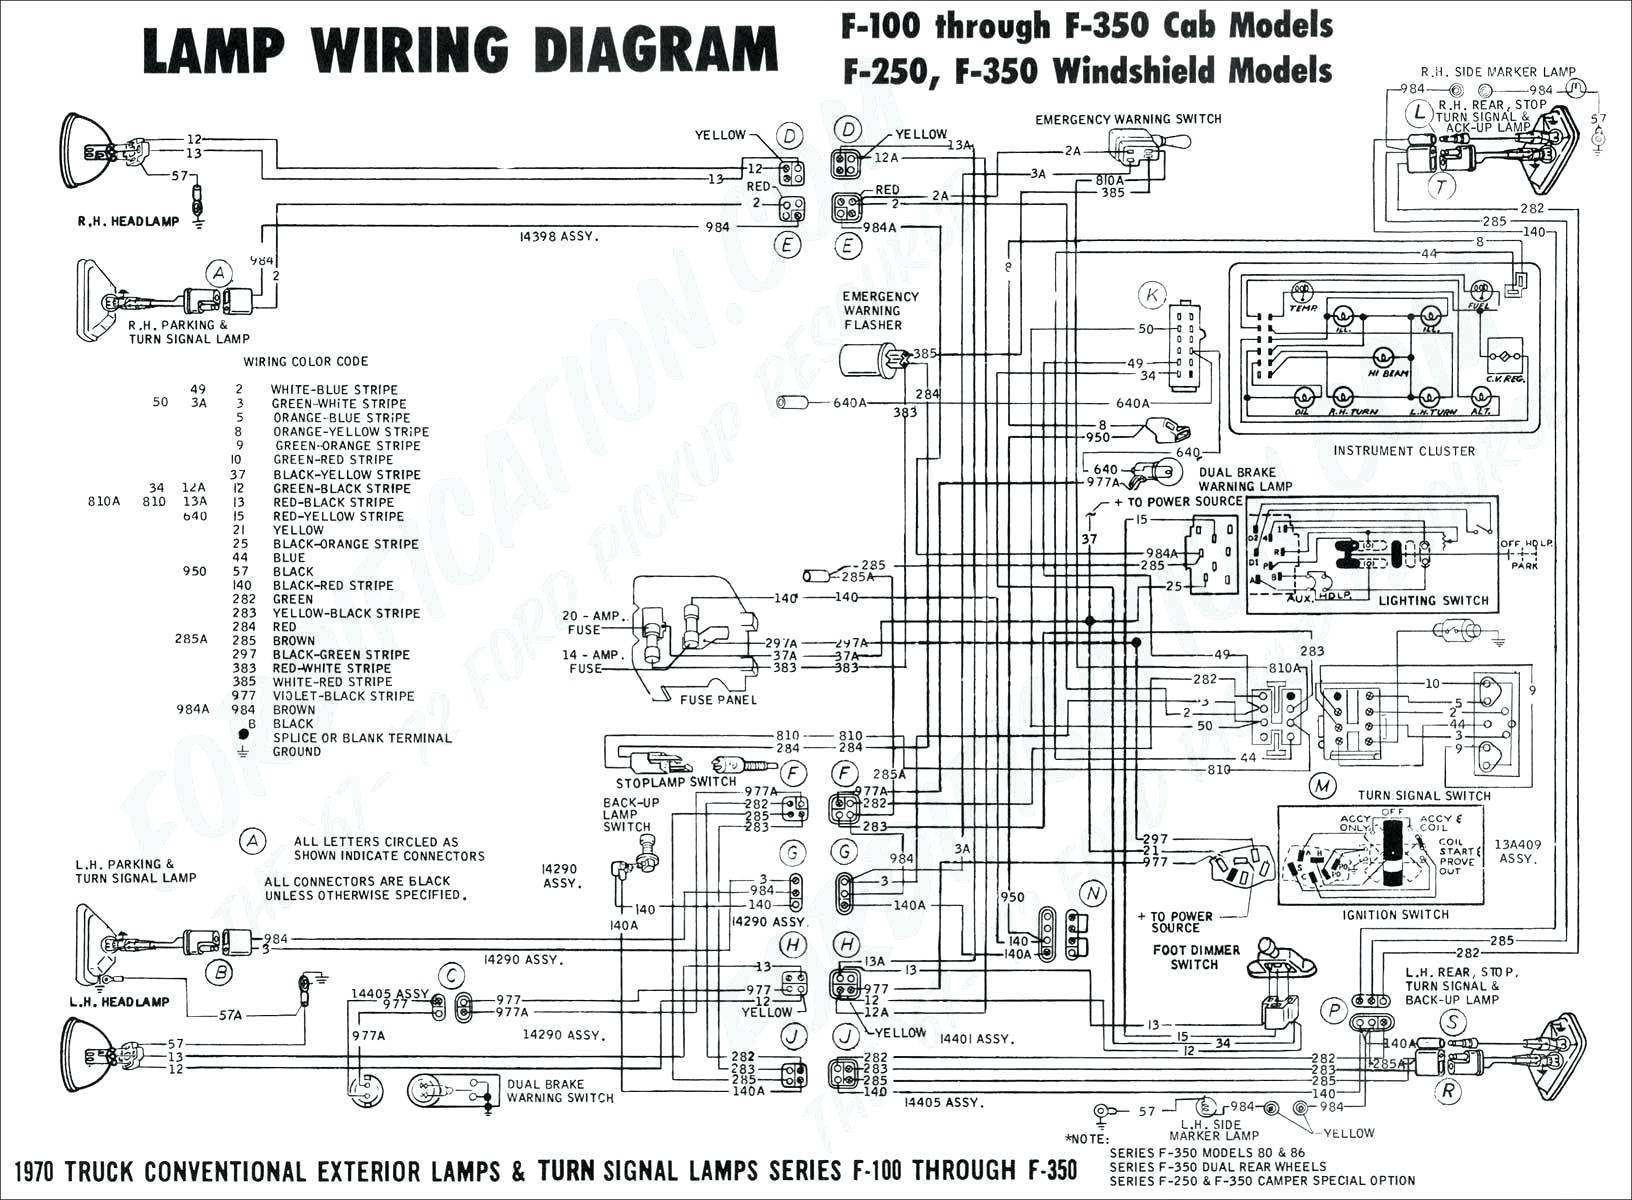 velvac mirror wiring diagram chevrolet